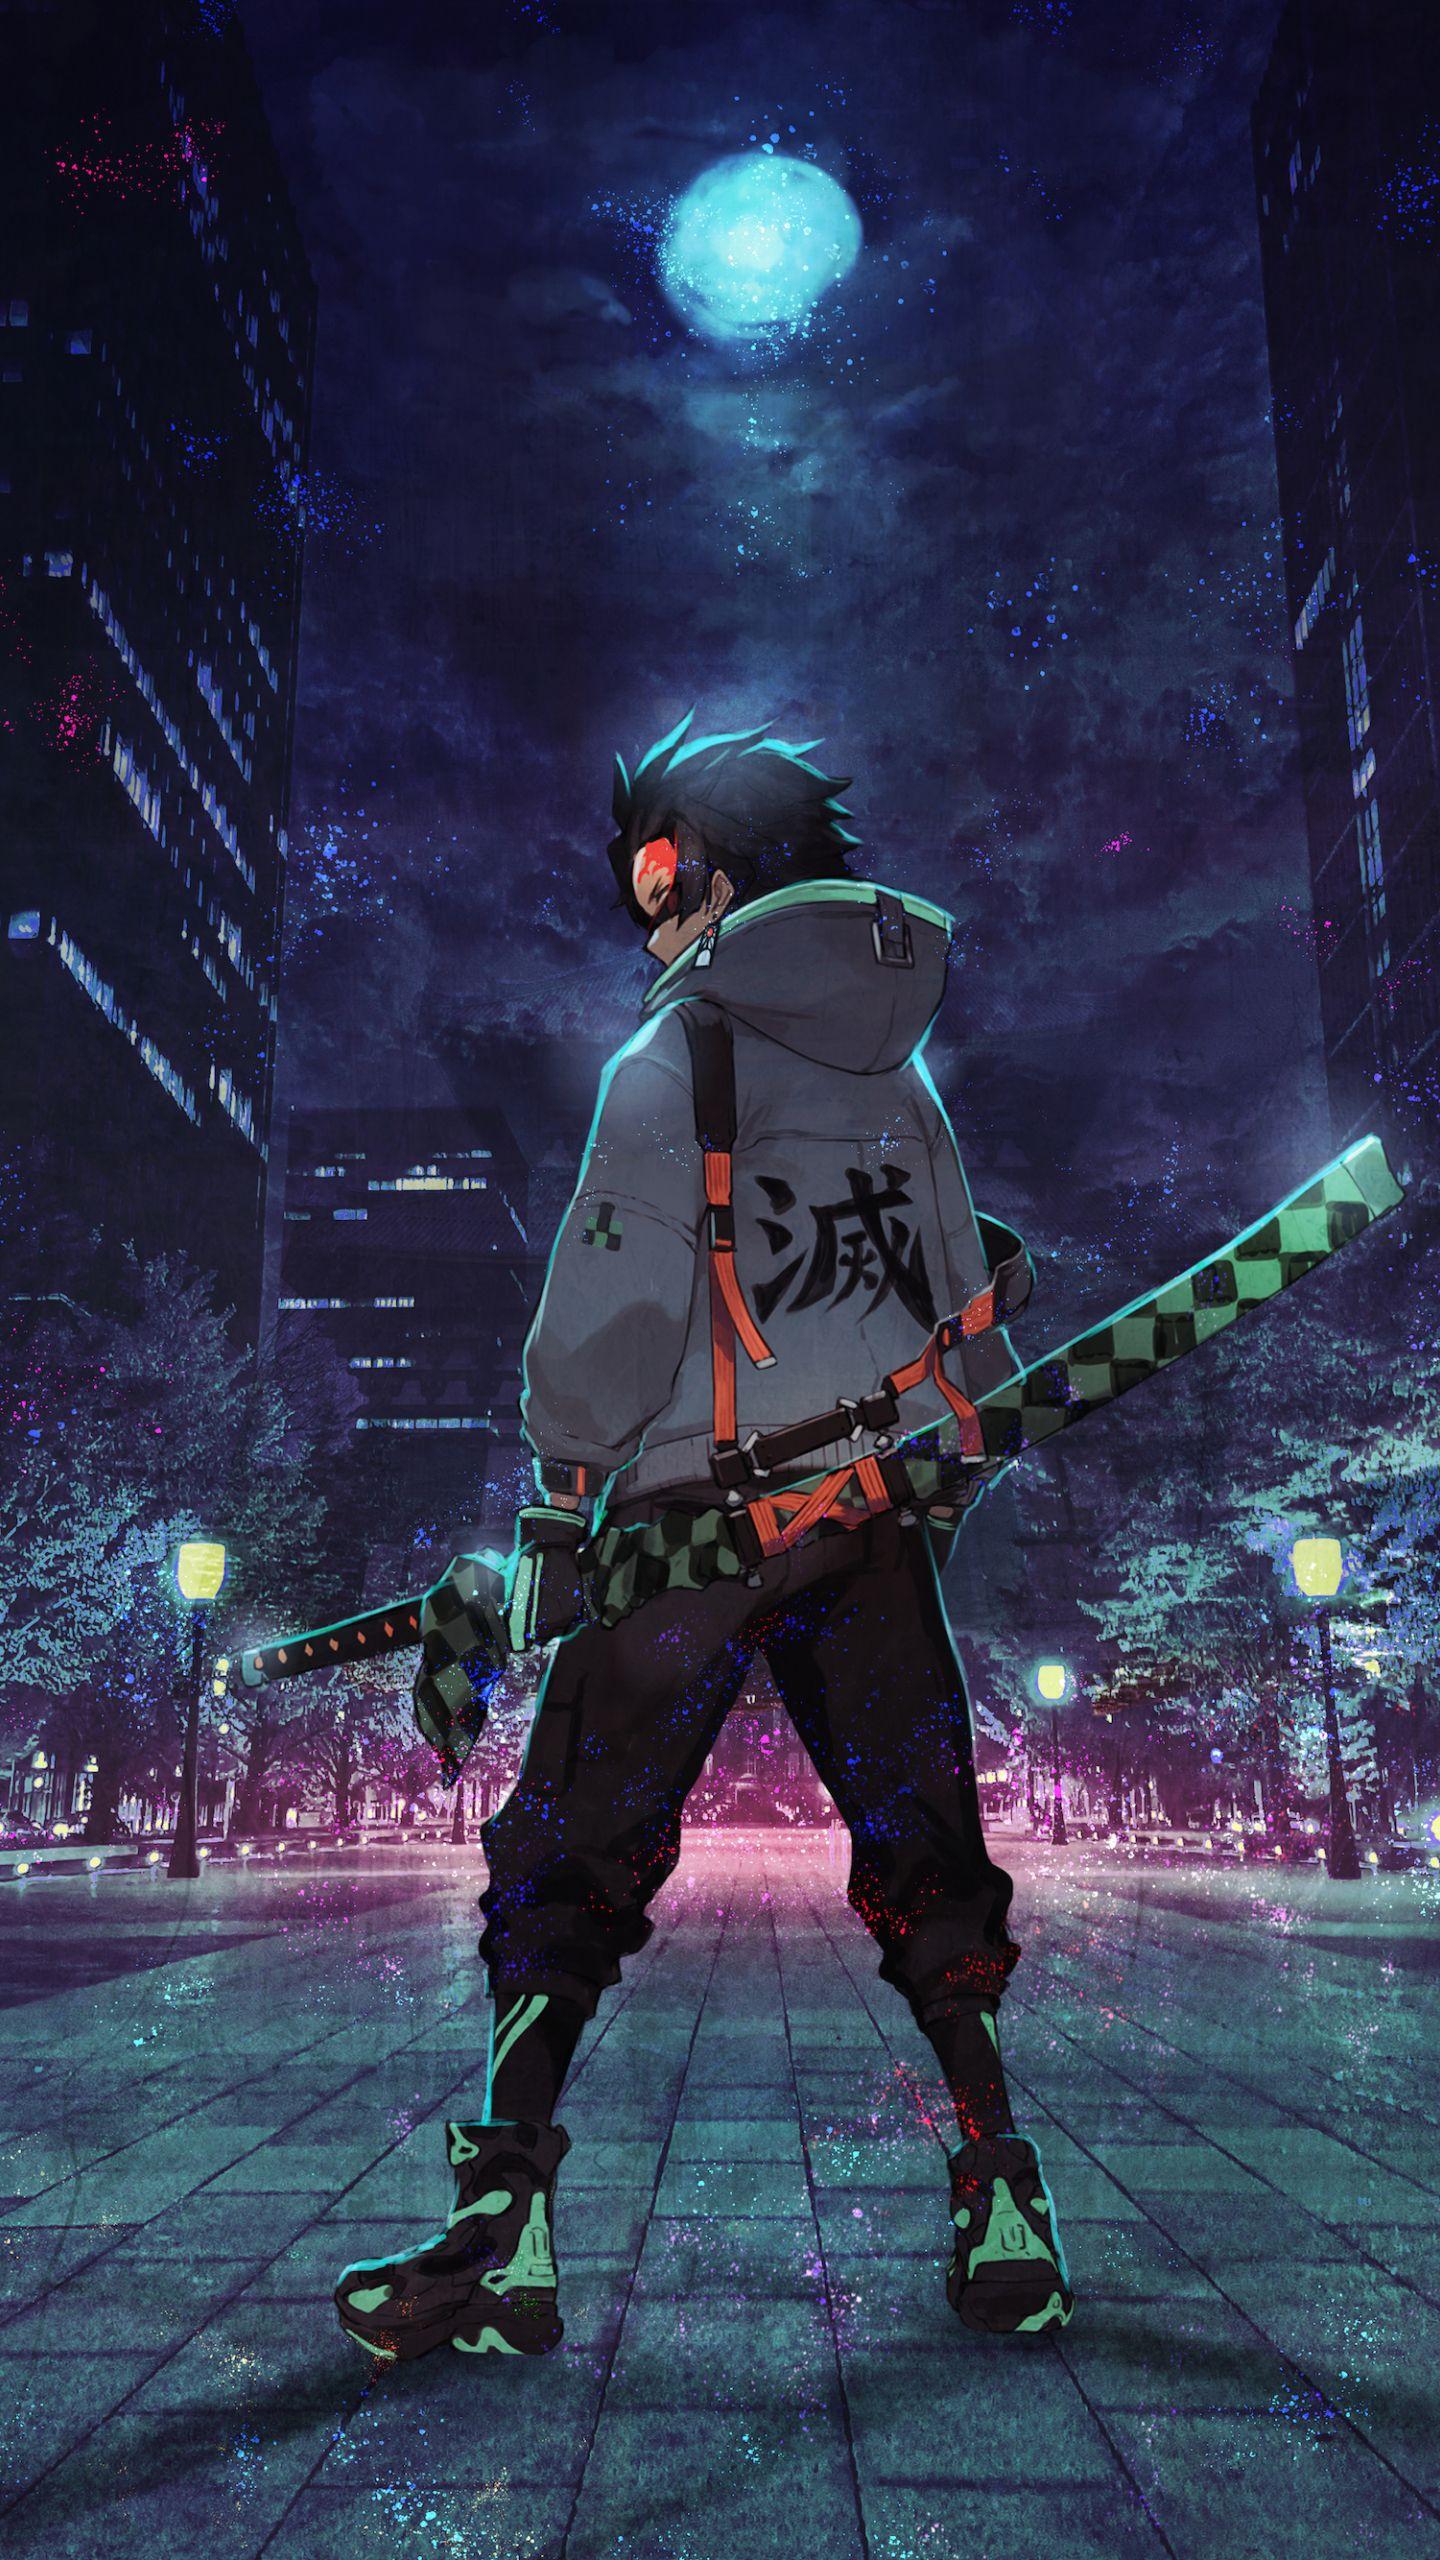 Urban ninja, anime, art, 1440x2560 wallpaper